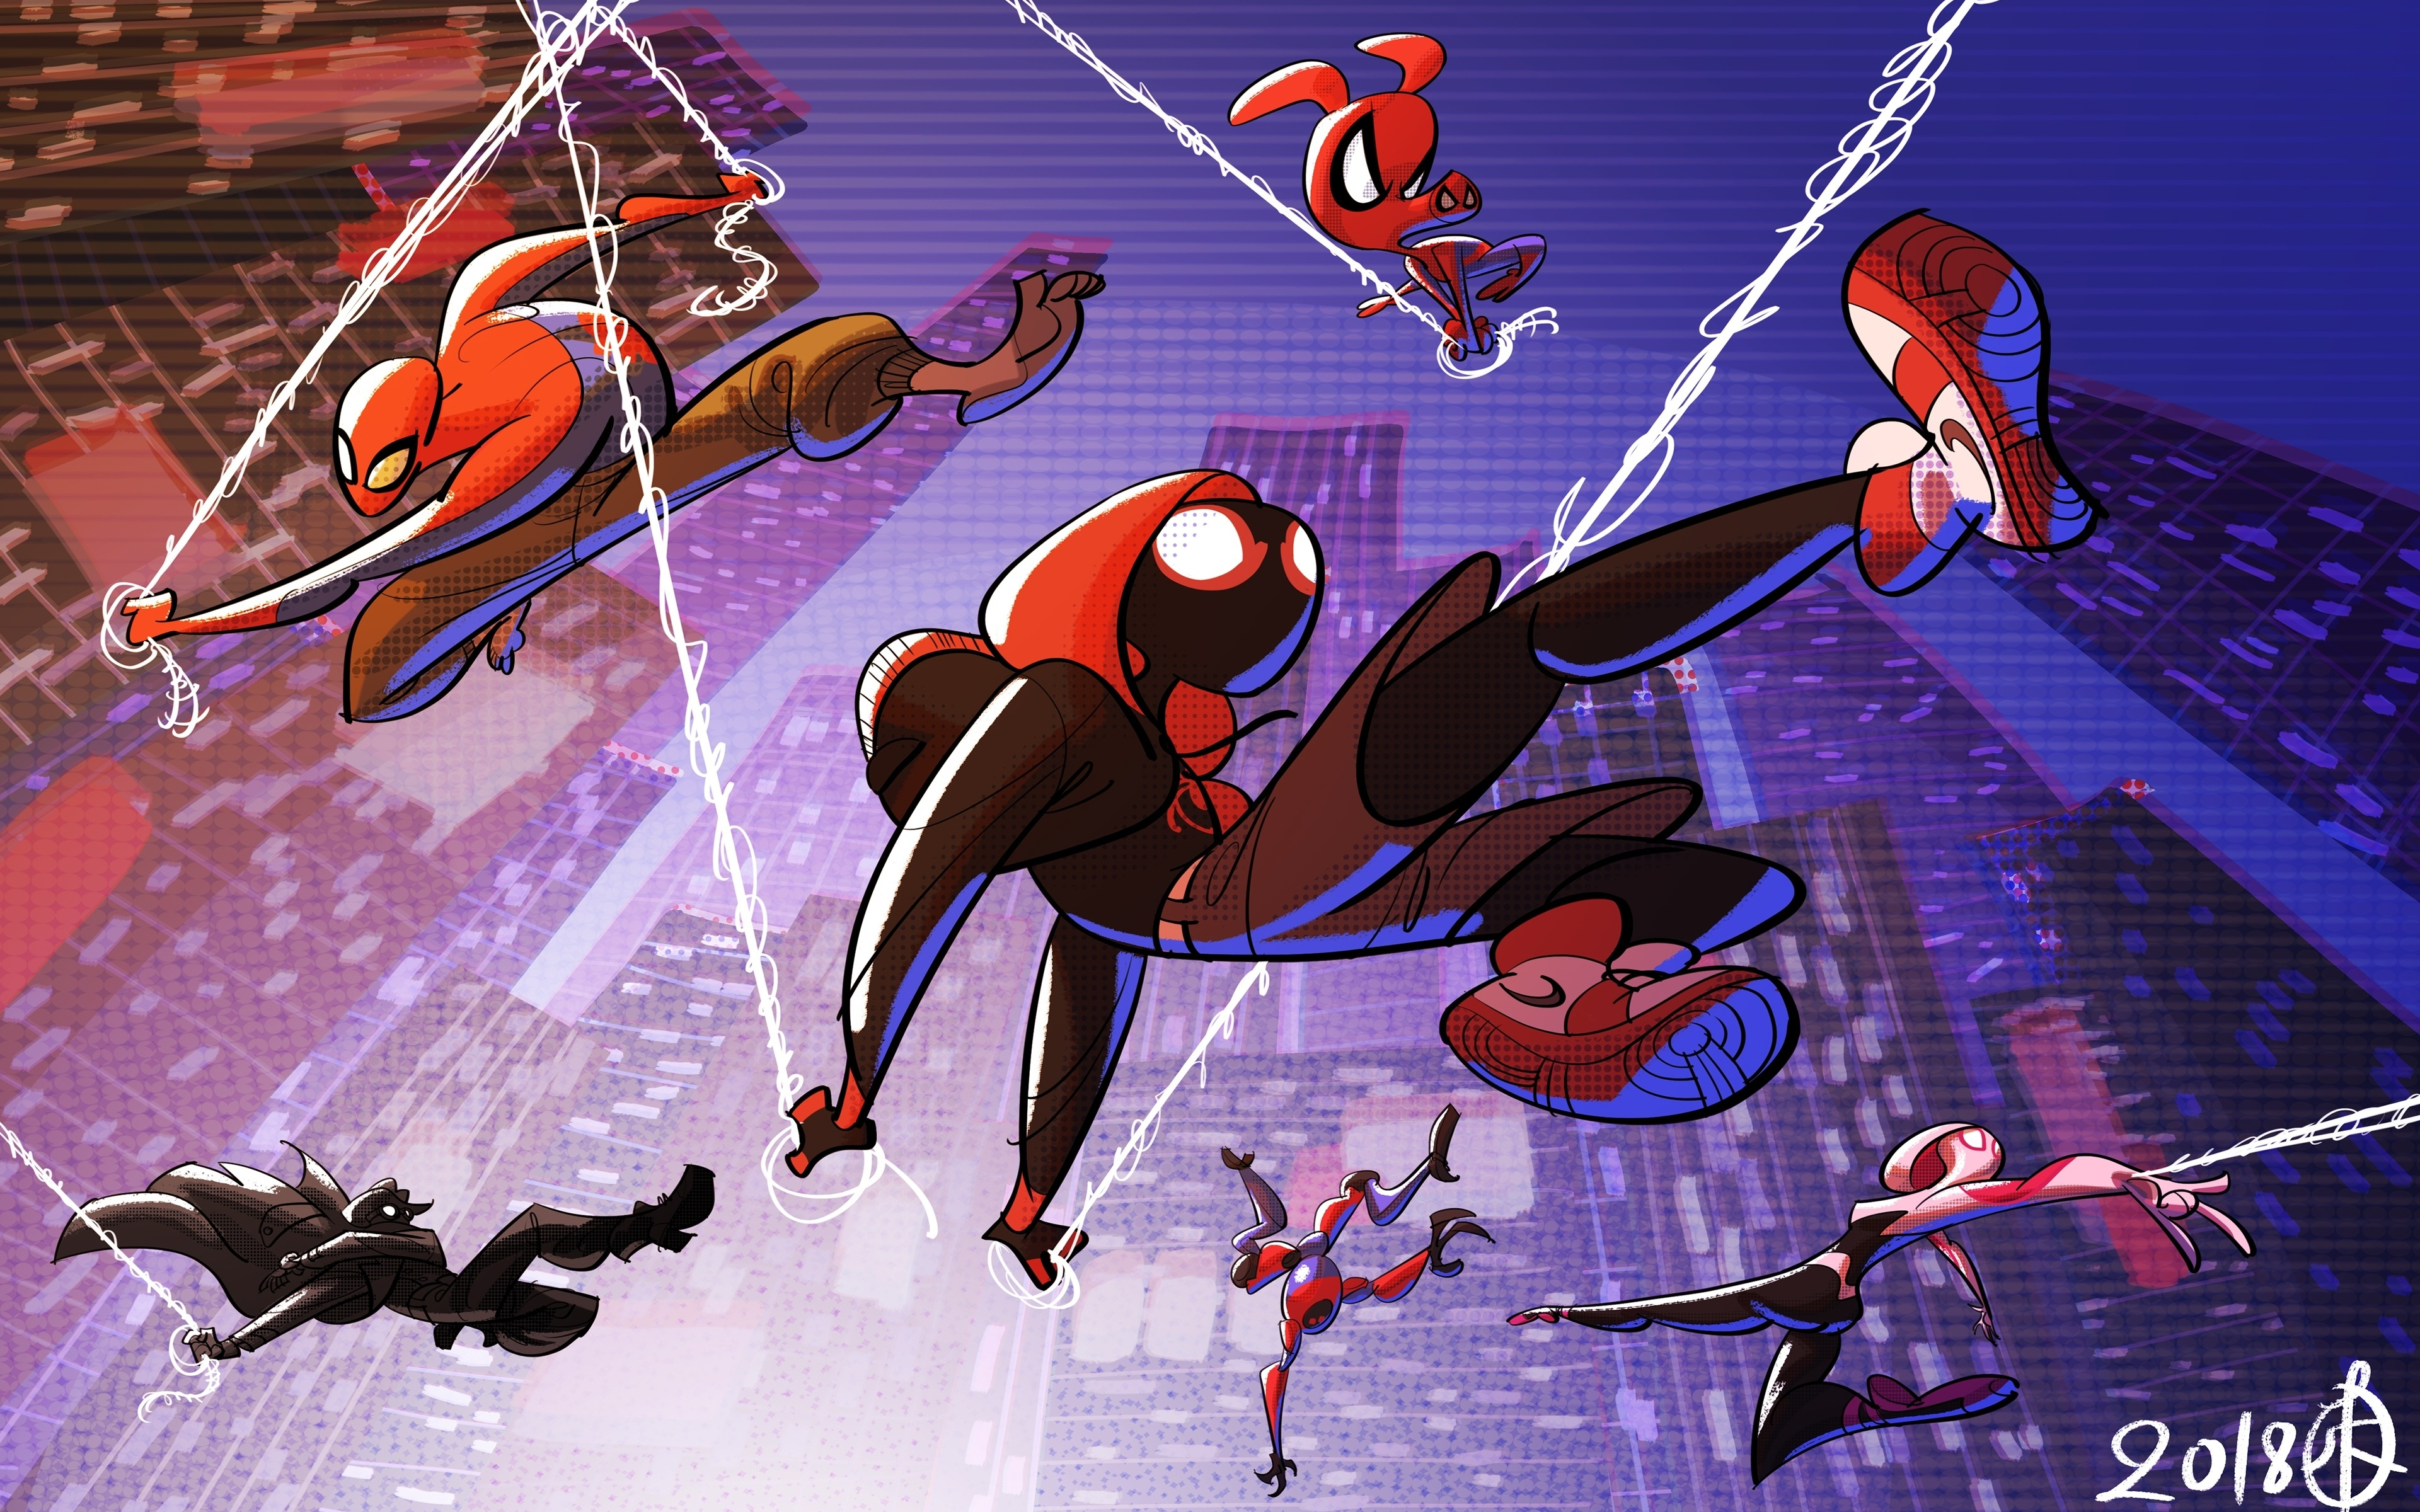 Download 3840x2400 Wallpaper All Superheroes Movie Artwork